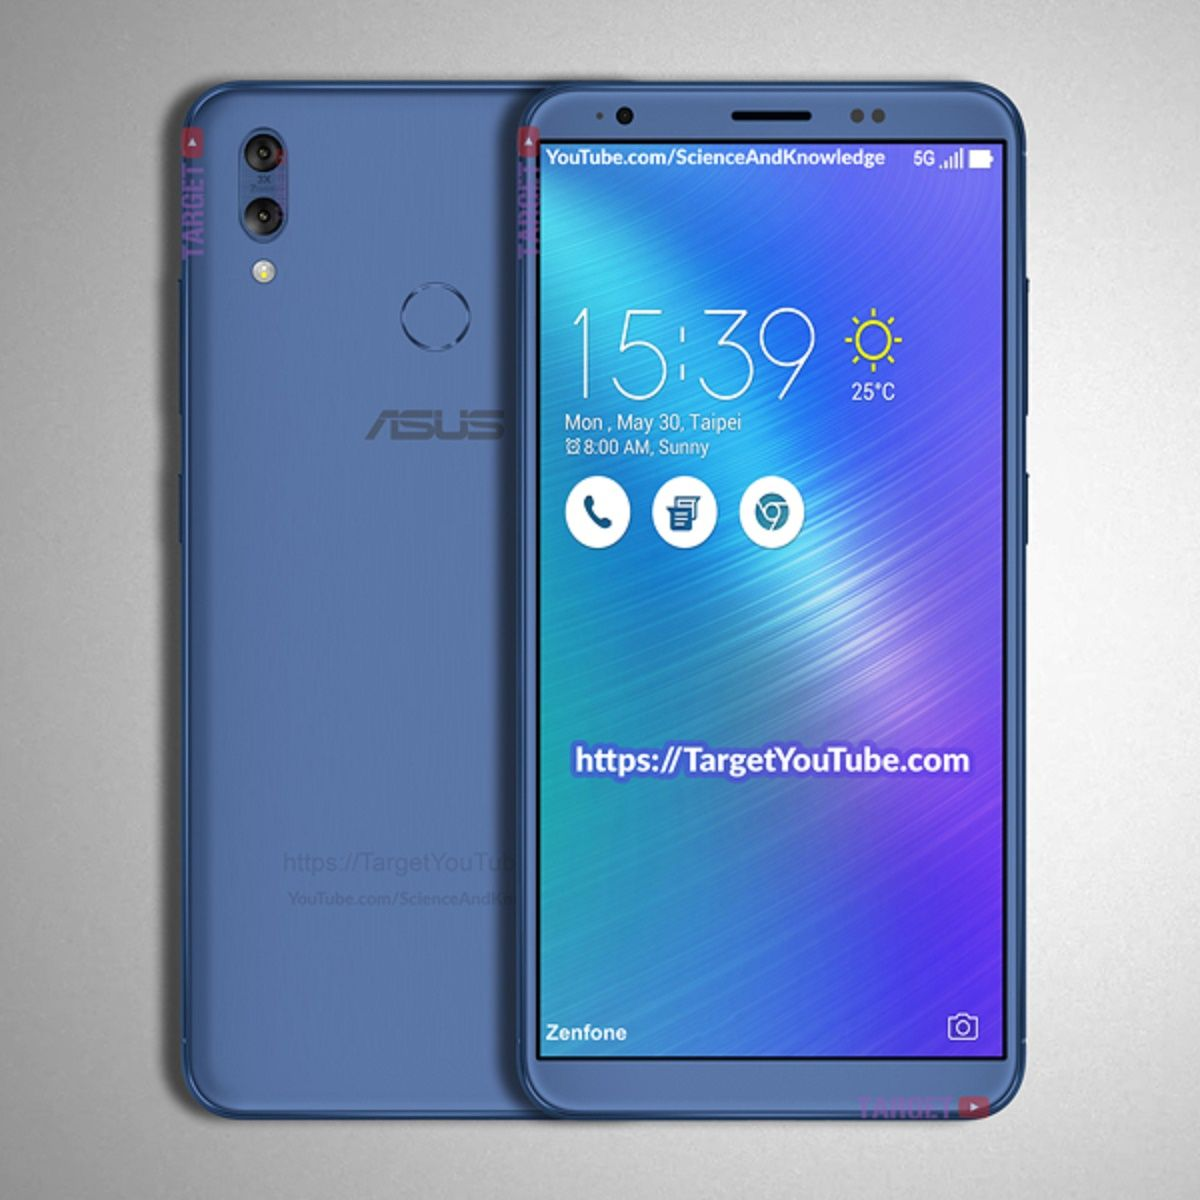 Asus Zenfone 5 (2018) Price In Bangladesh and Full ...